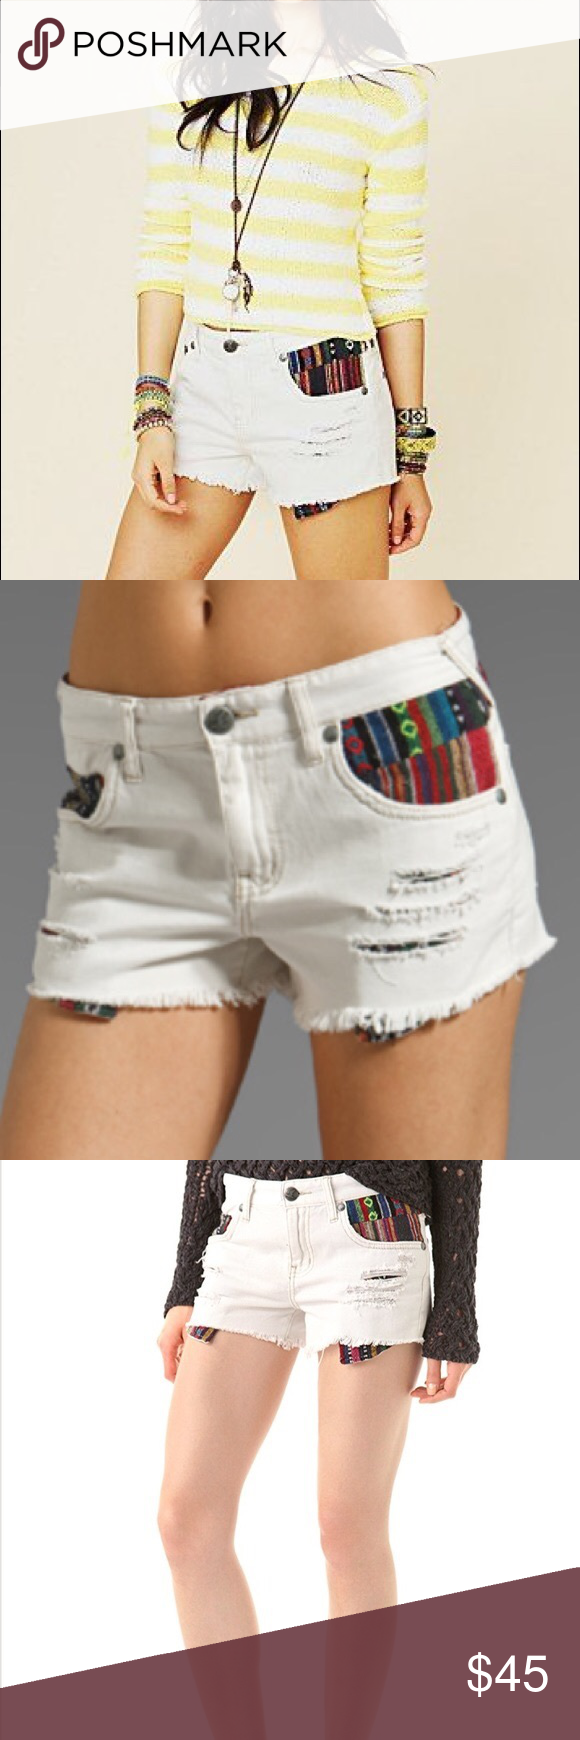 Free People Baja White Denim Cutoff Shorts ???? Coming Free People Shorts #denimcutoffshorts